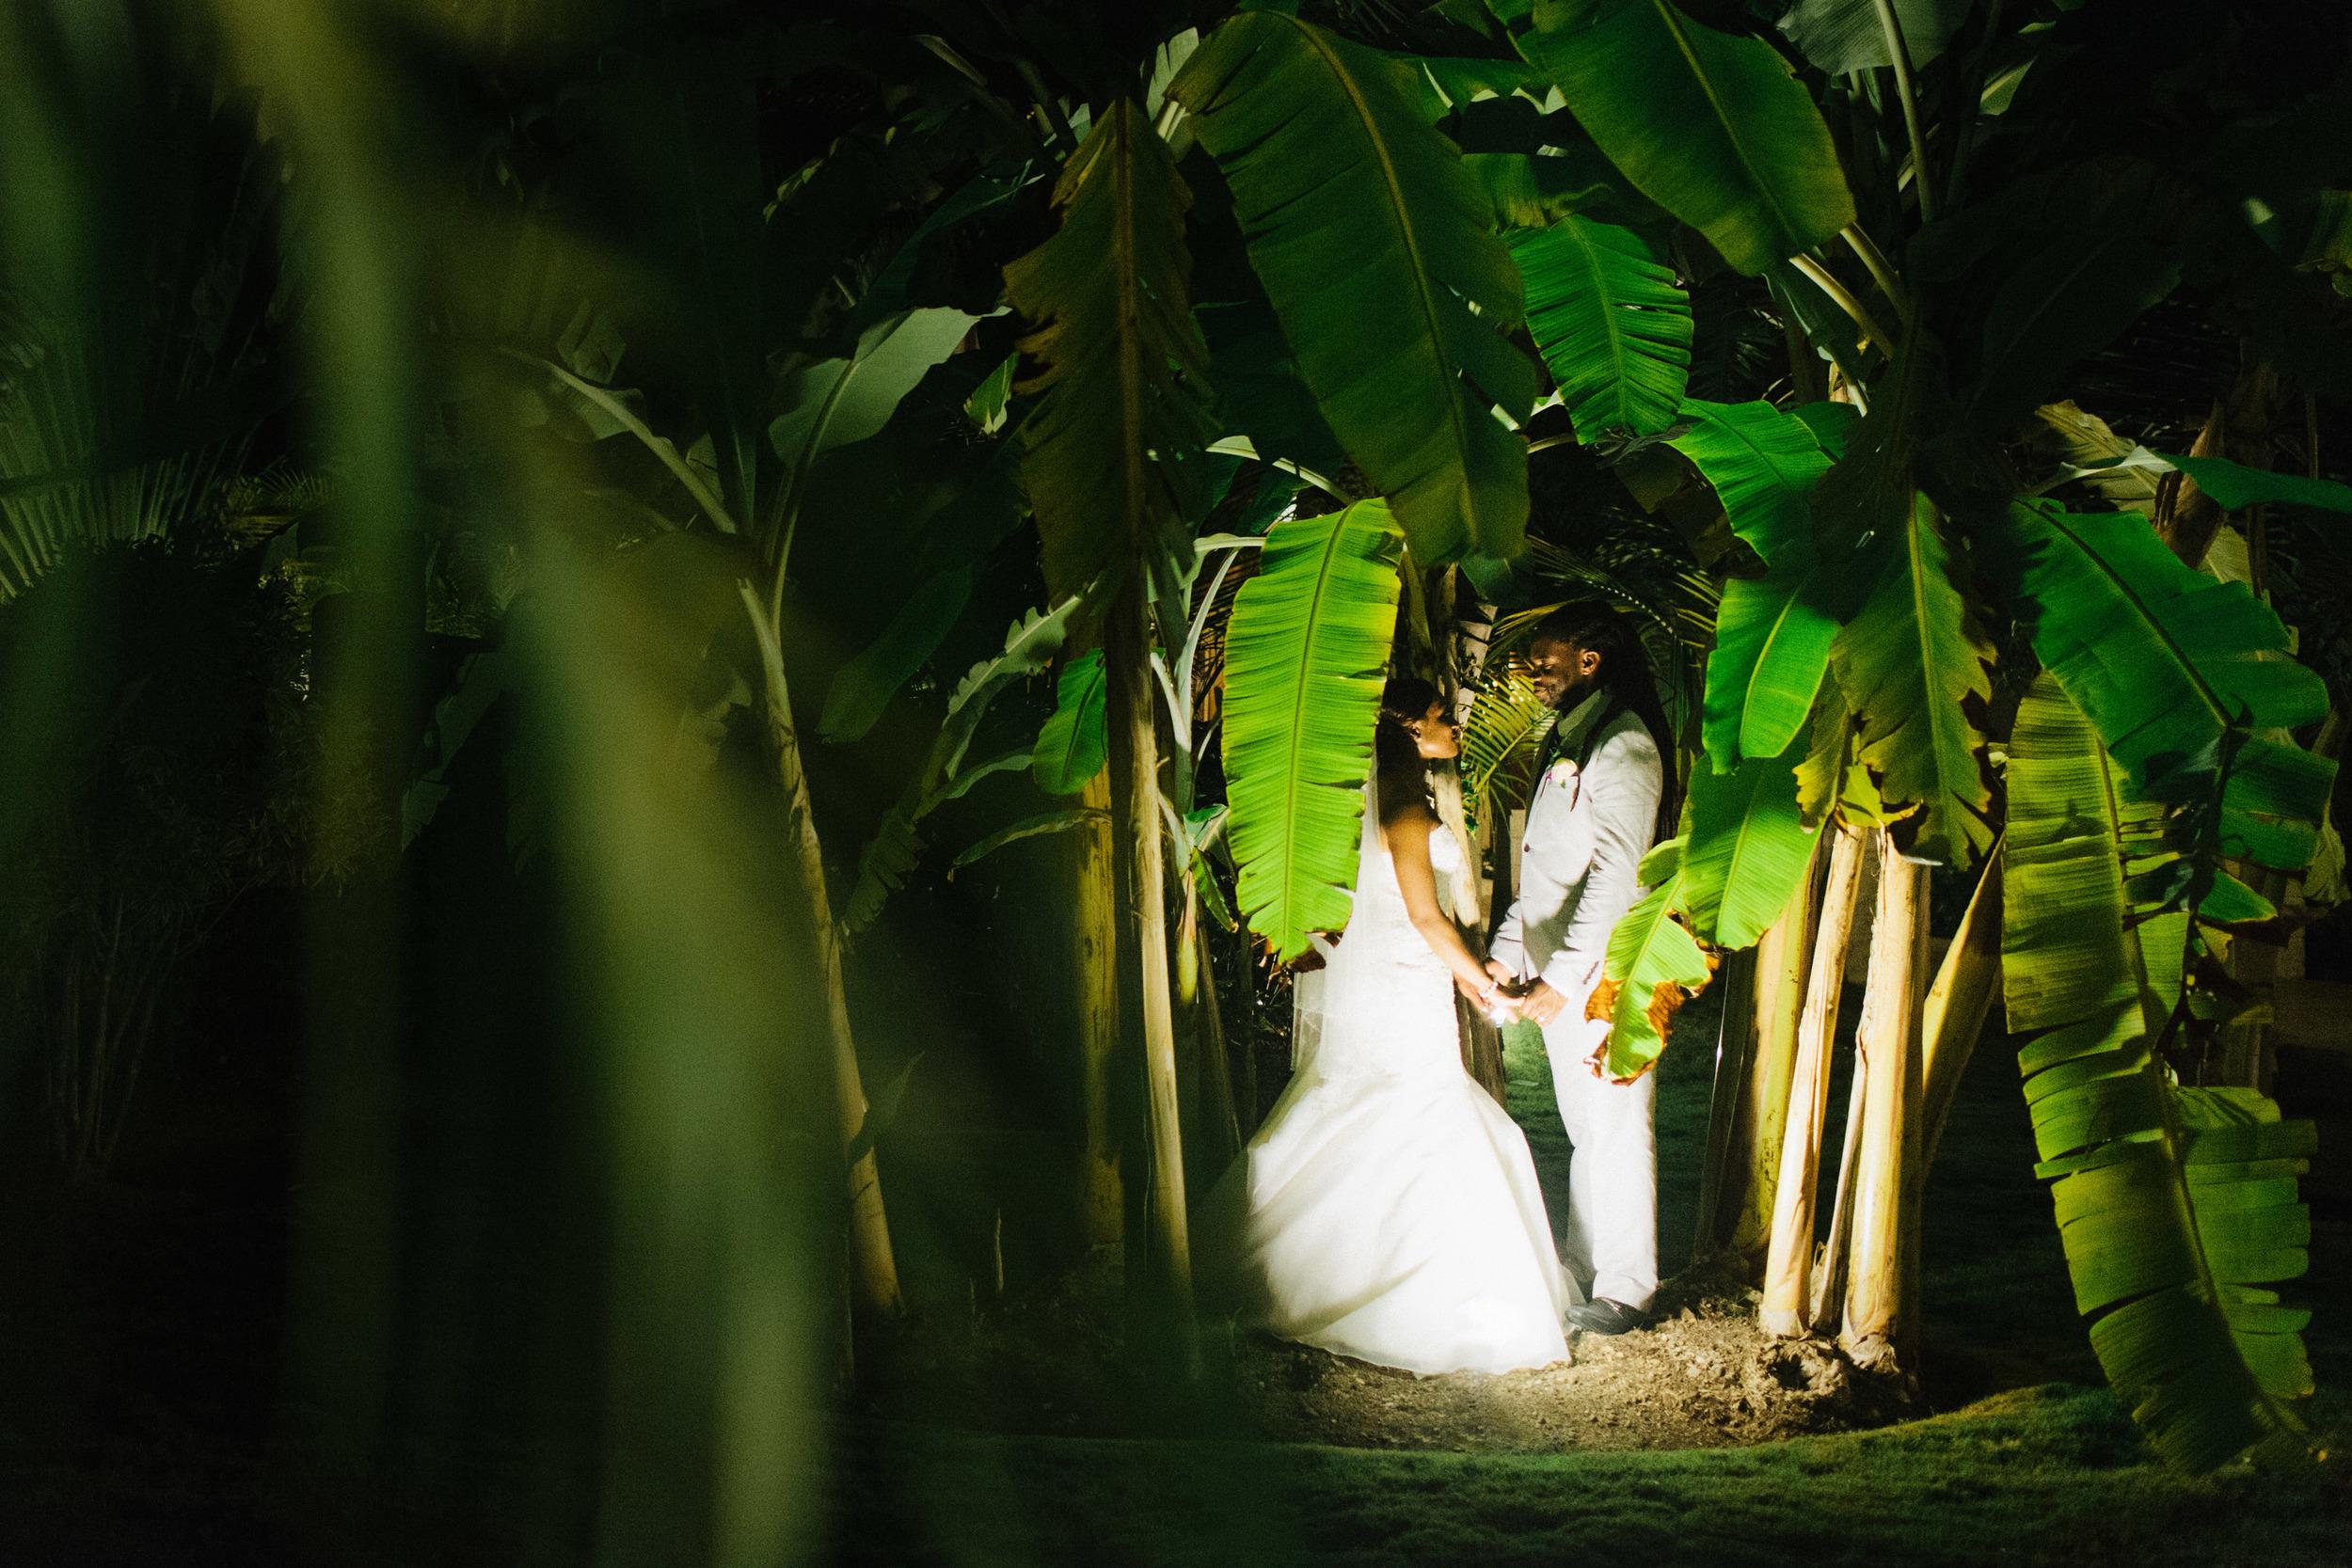 michael-rousseau-photography-dominican-republic-destination-wedding-cara-jason-colonial-majestic-dominican-republic126.jpg